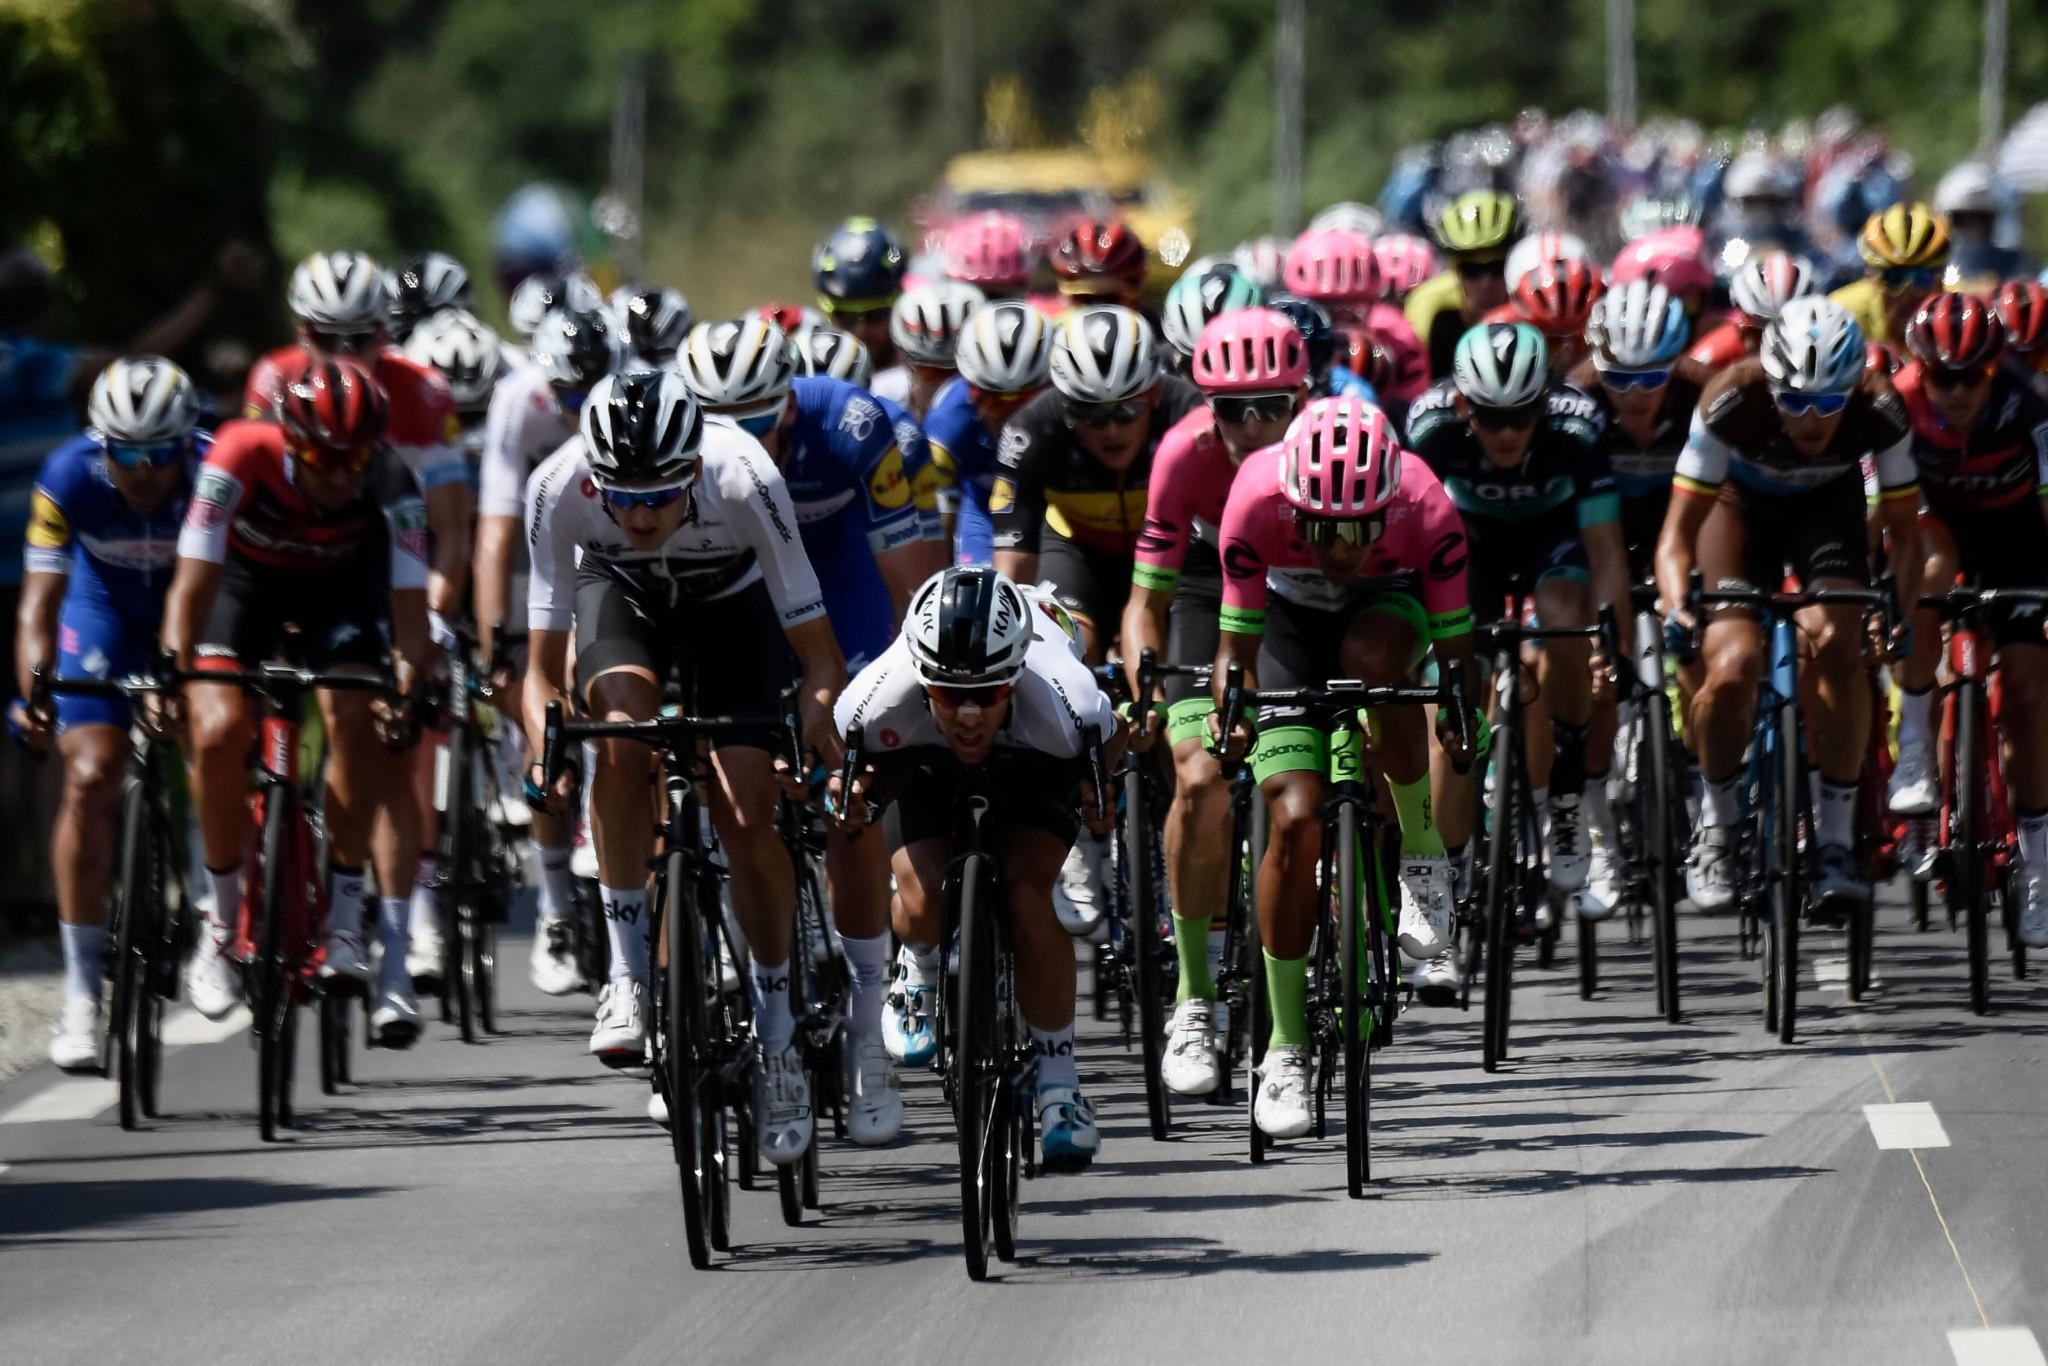 Brest confirmed as replacement Grand Depart host of 2021 Tour de France